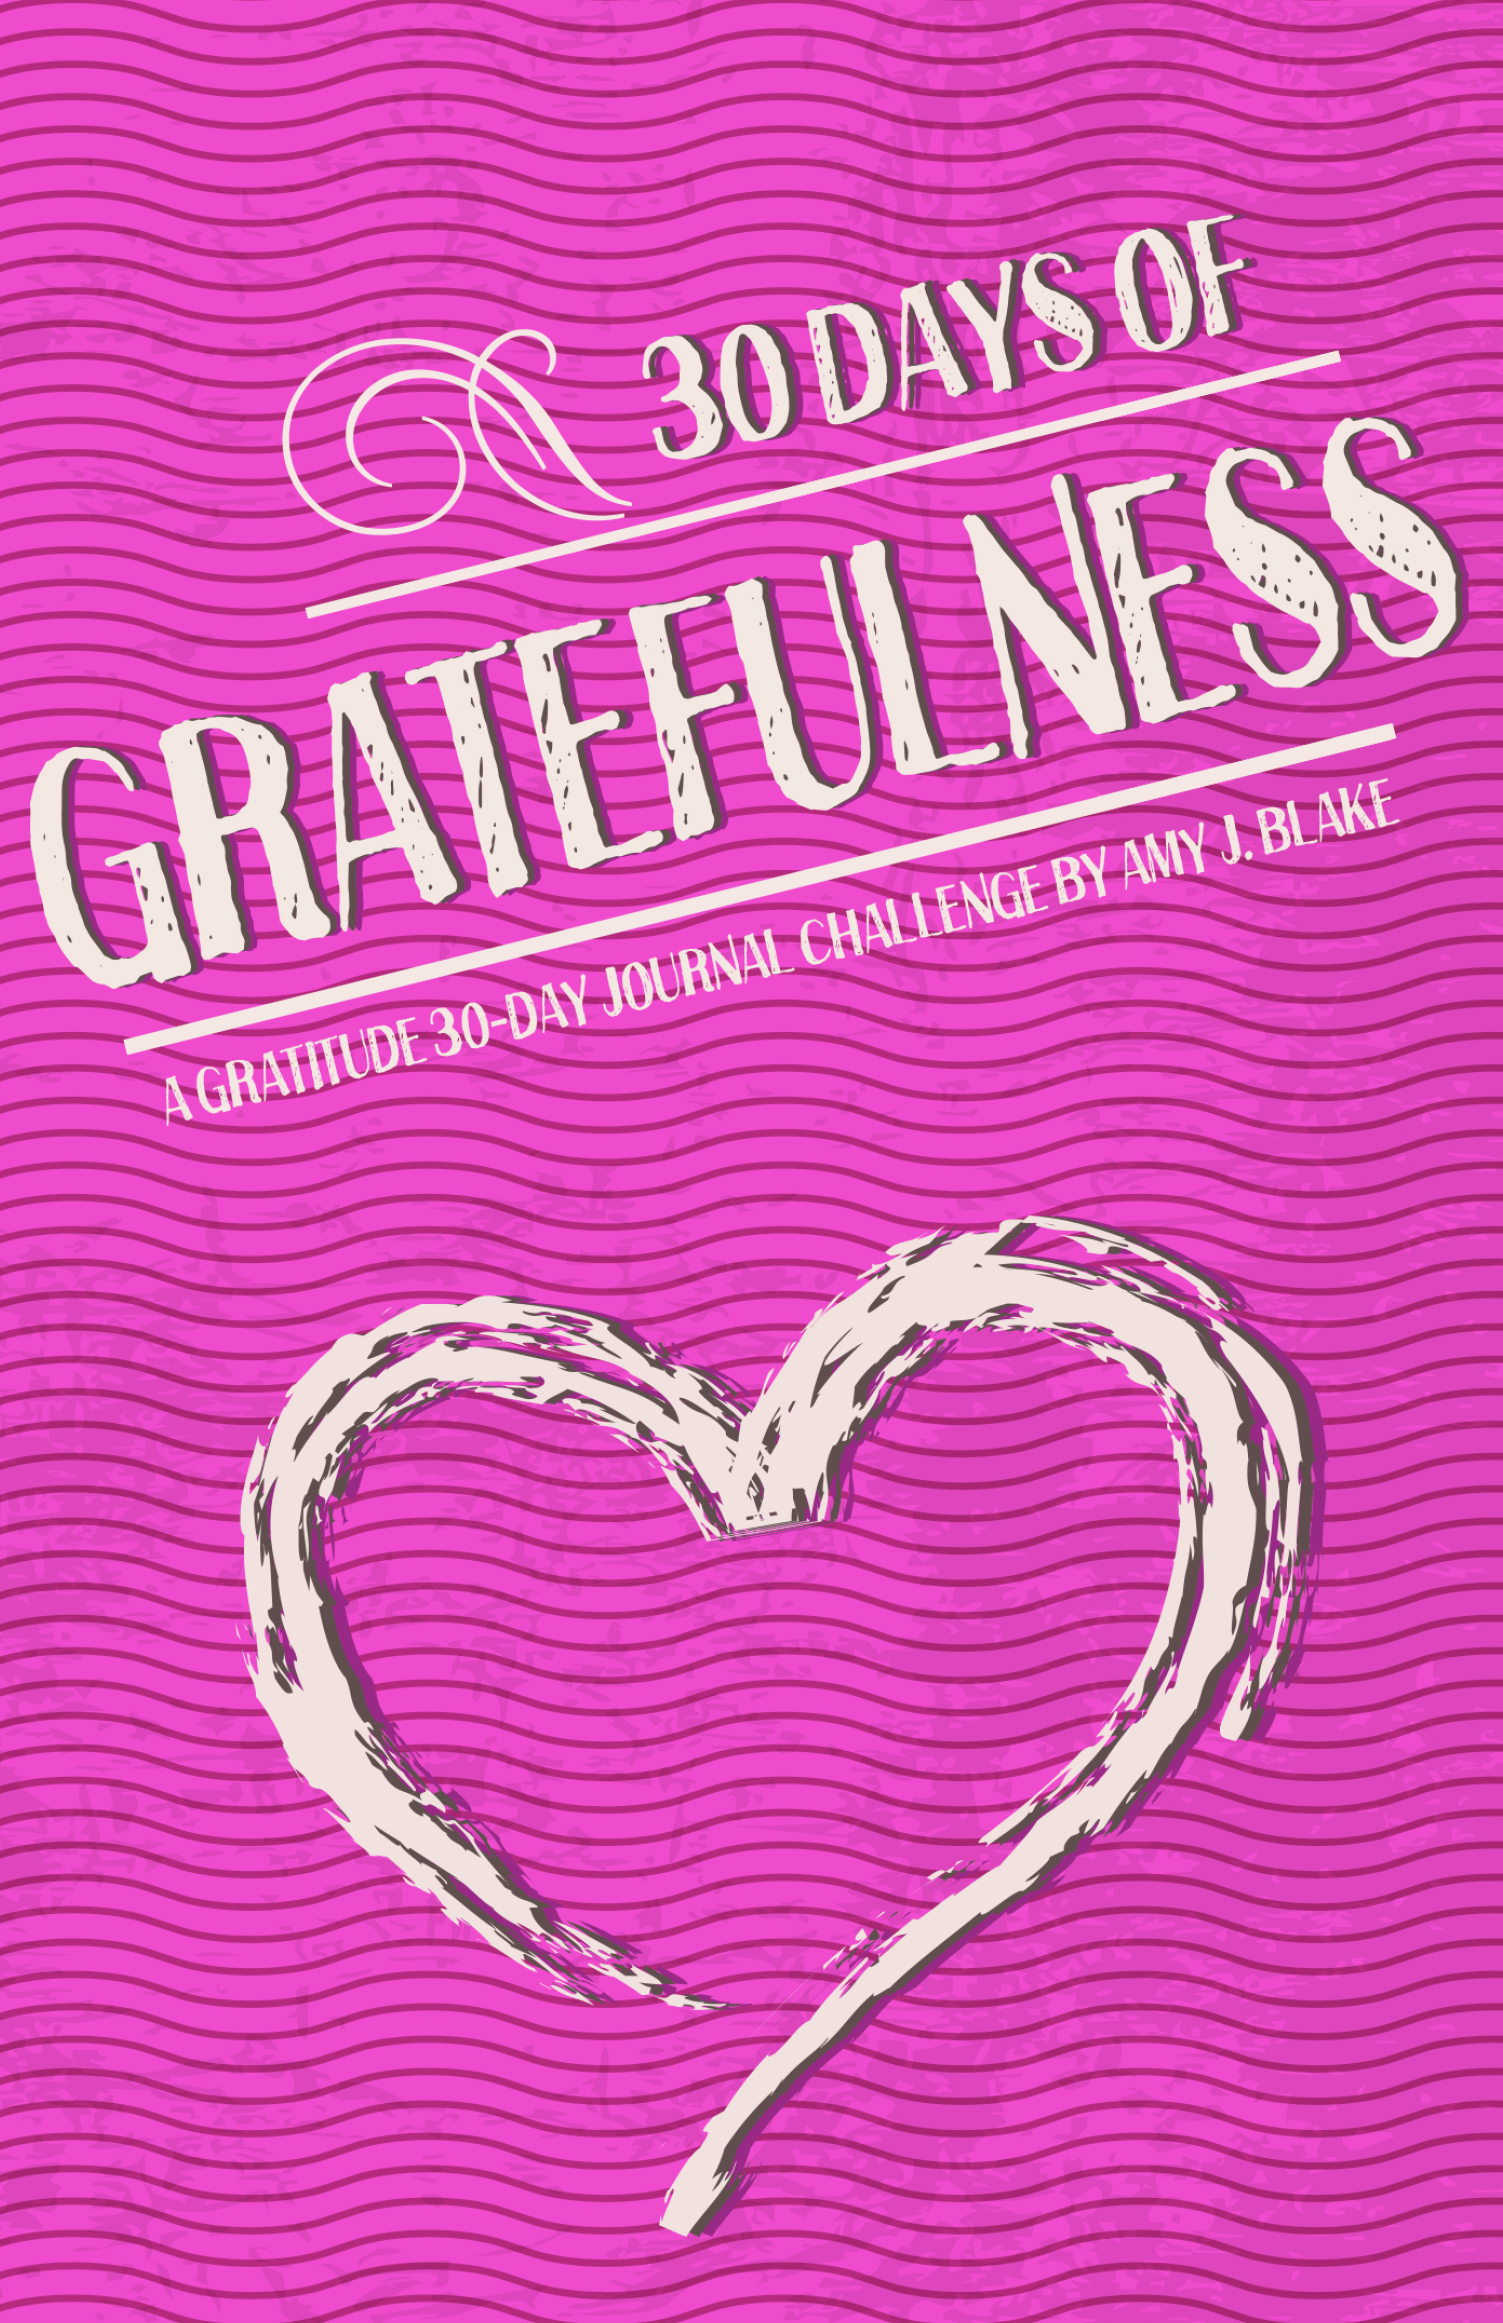 gratitude-journal-30-days-of-gratefulness-be-happier-healthi(1)